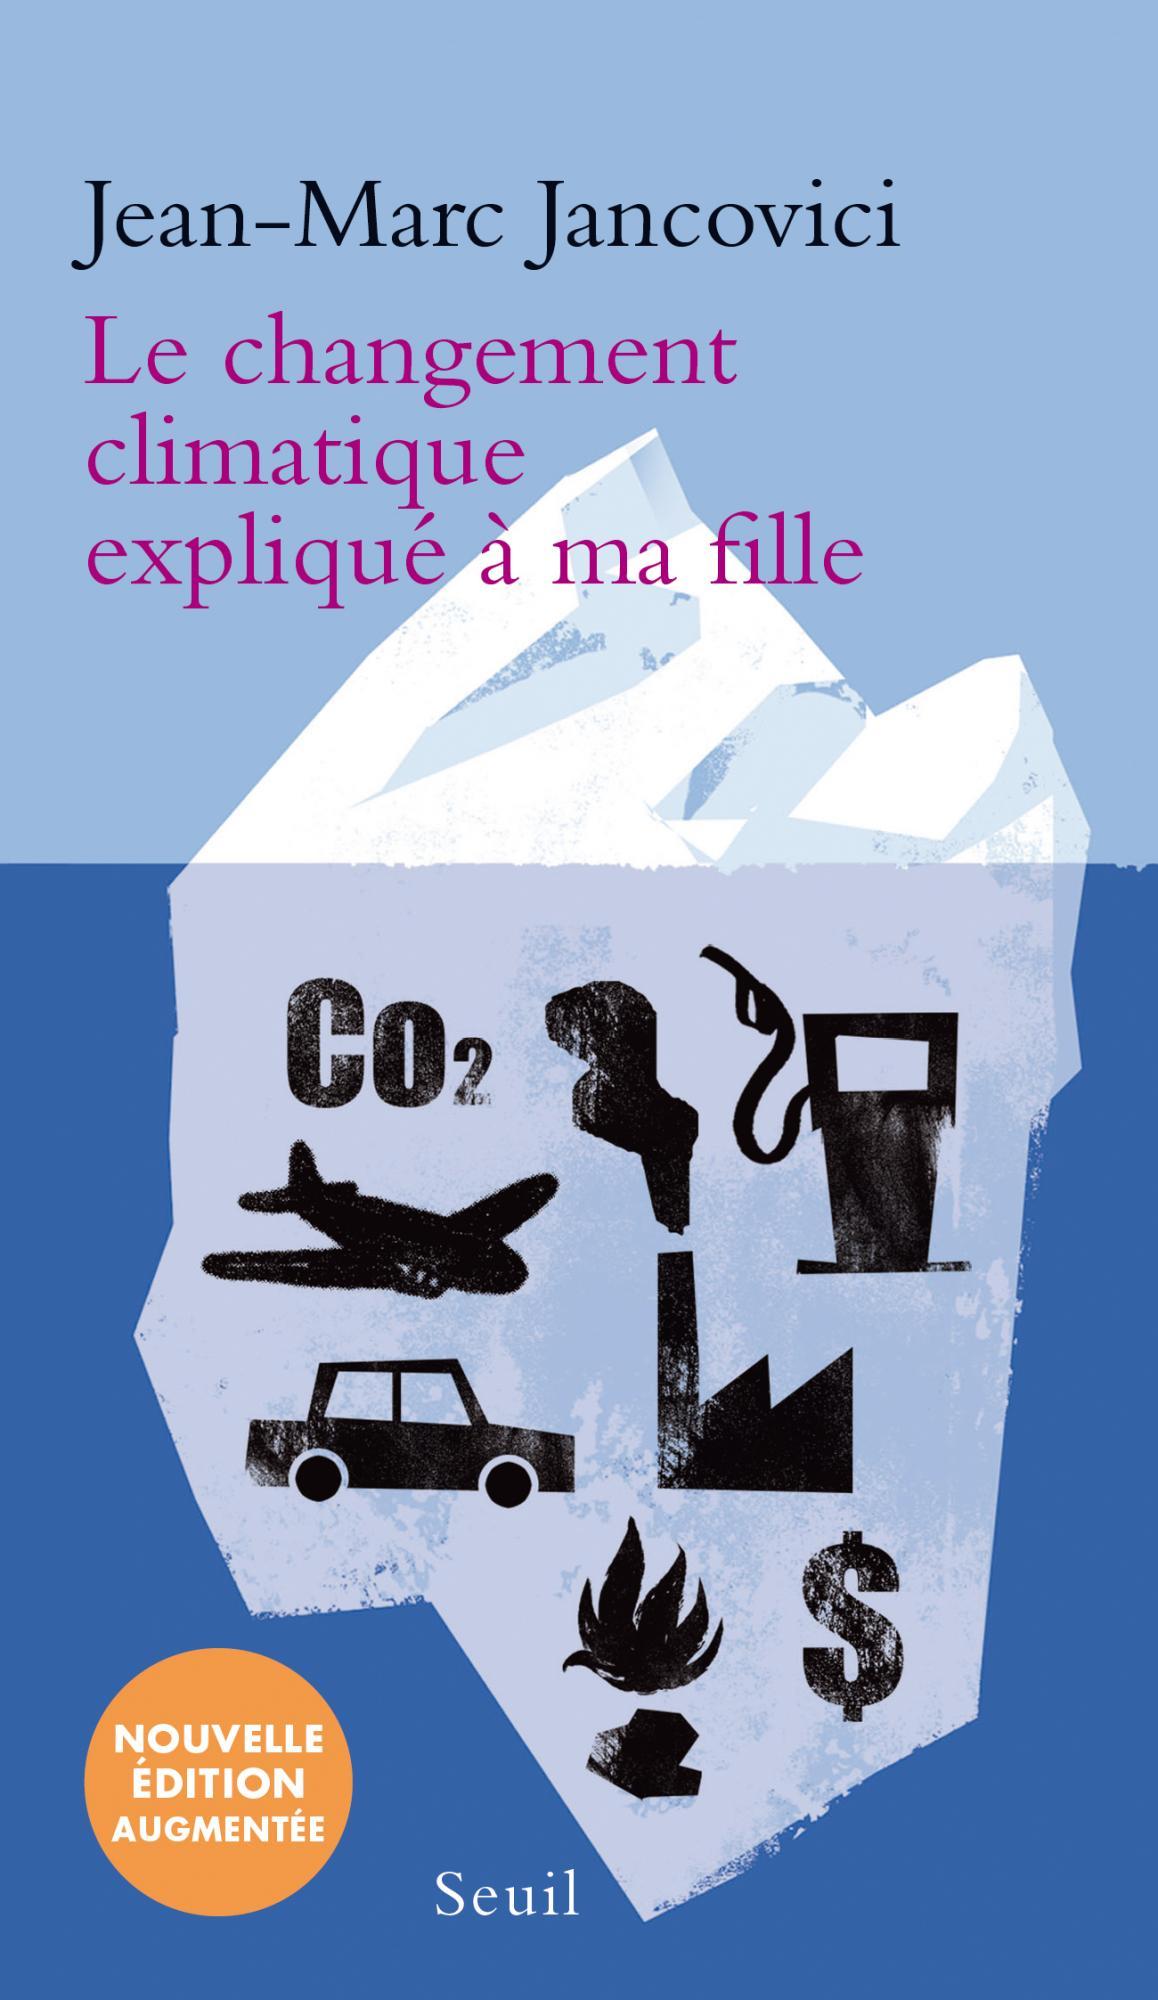 Lecture-Explique-Fille-cover